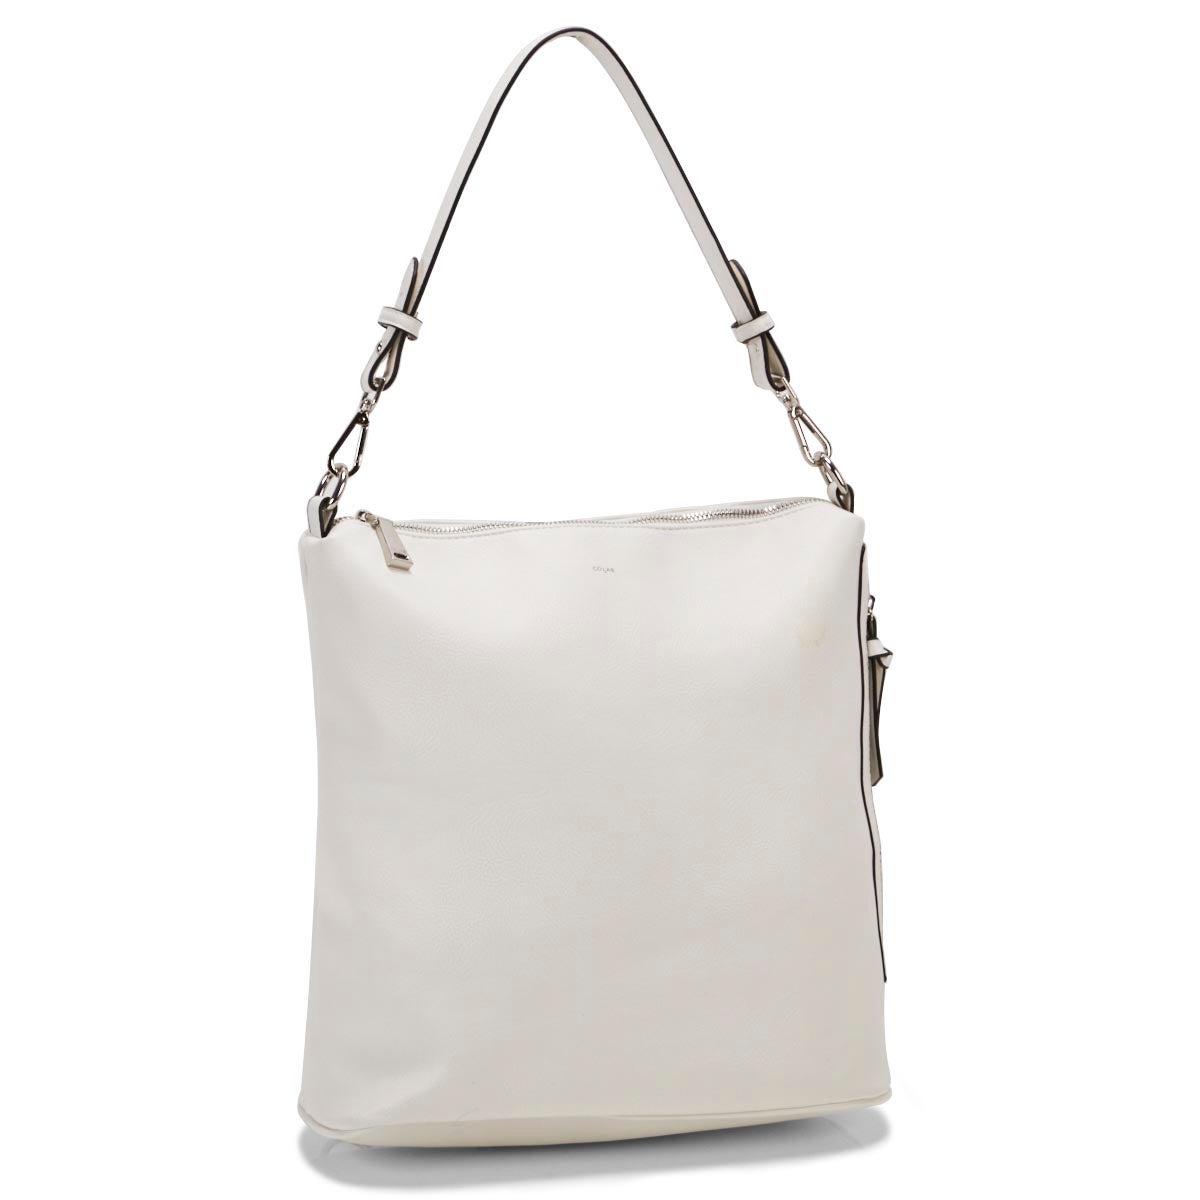 Women's 6257 Convertible Hobo Bag - White